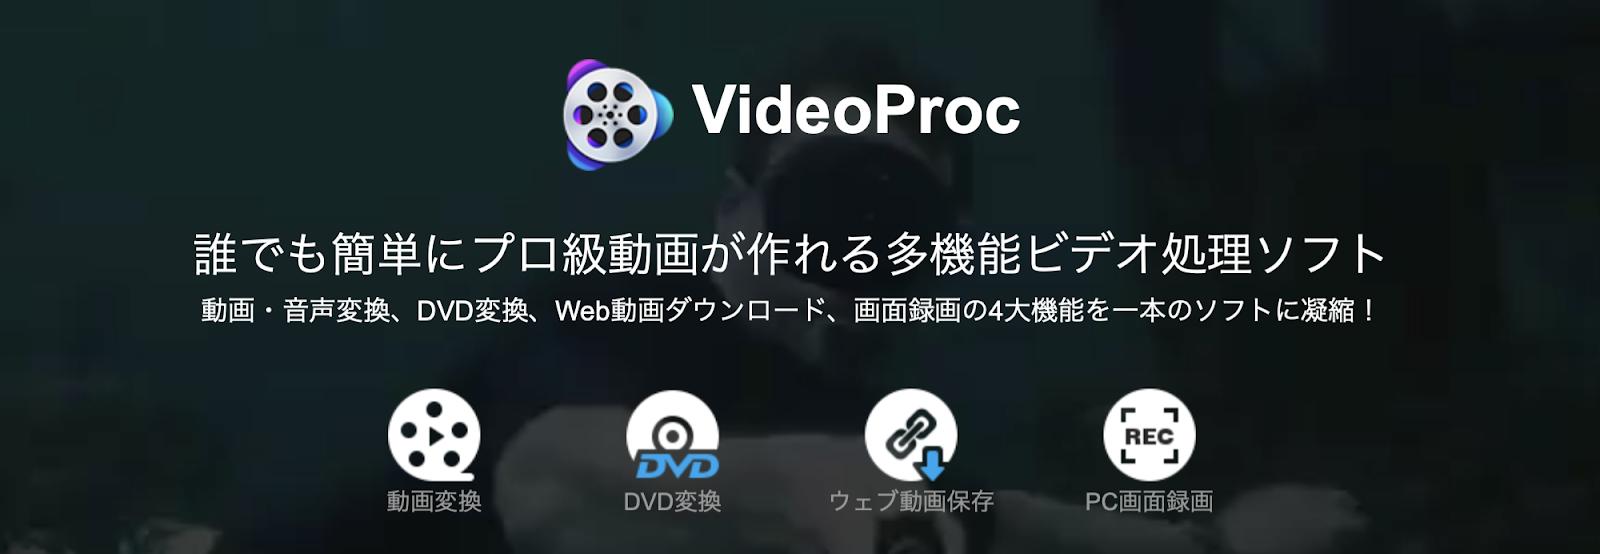 VideoProcで出来ること